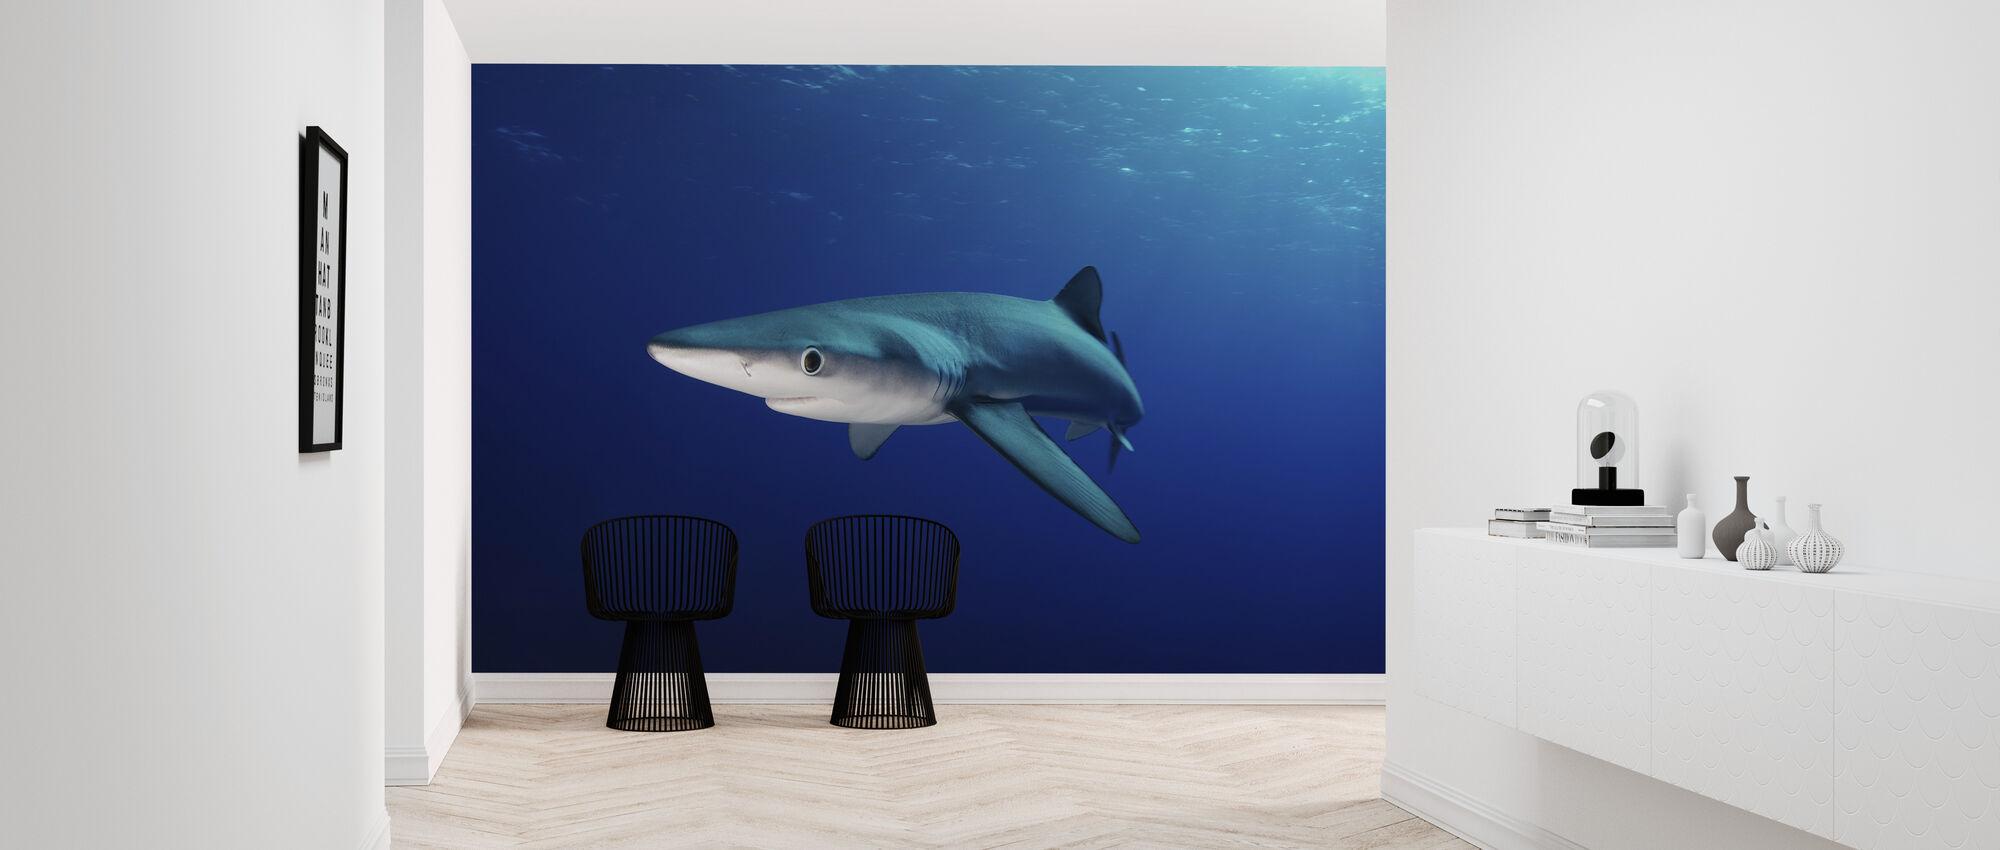 Lone Blue Shark - Wallpaper - Hallway